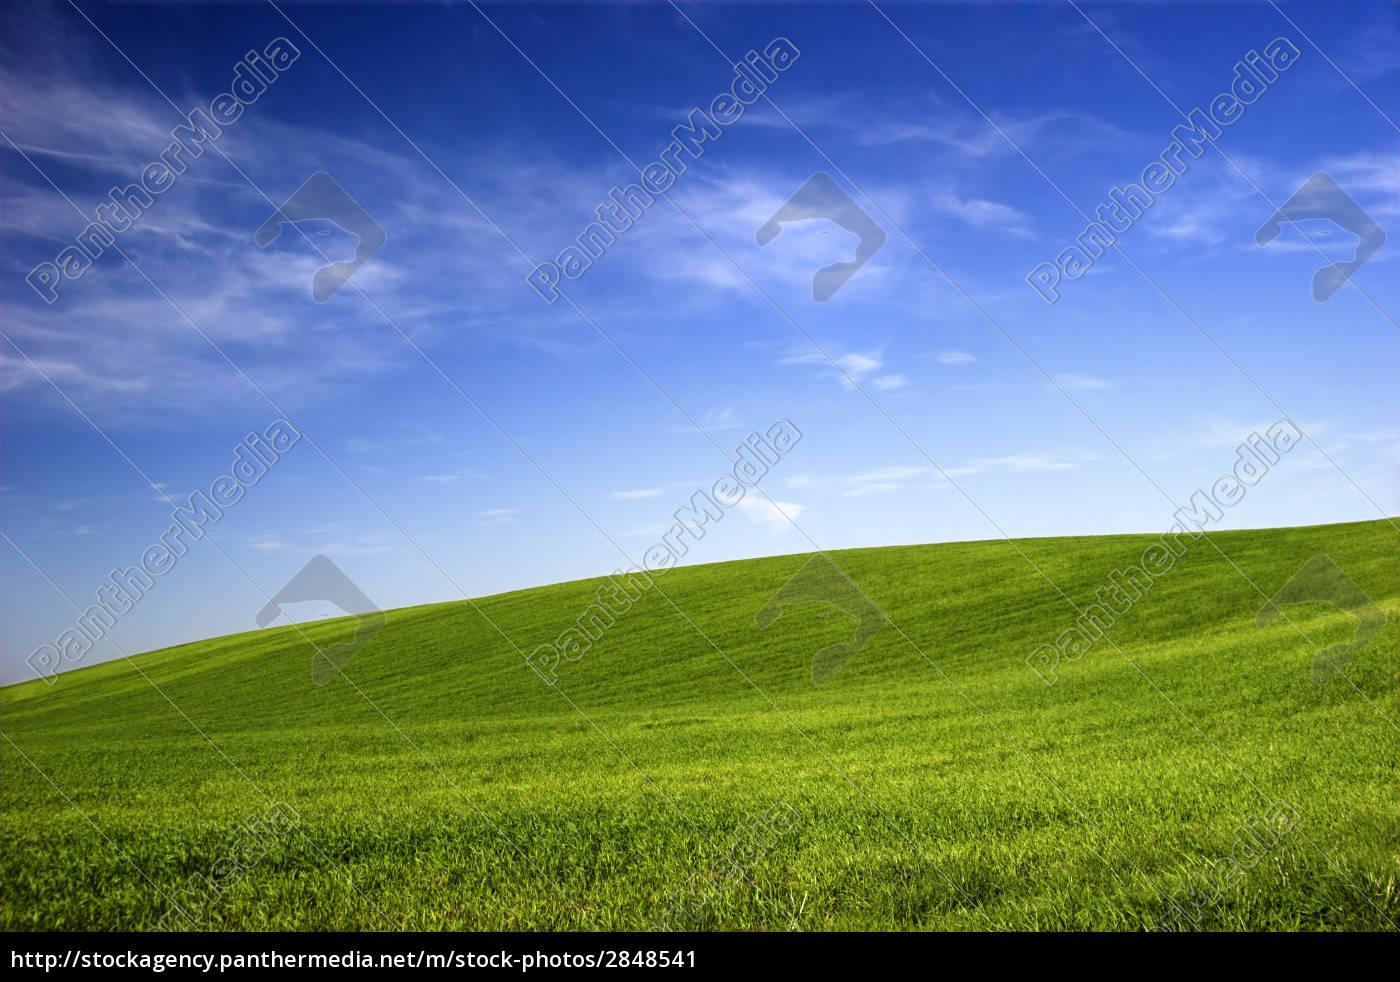 blue, beautiful, beauteously, nice, environment, enviroment - 2848541